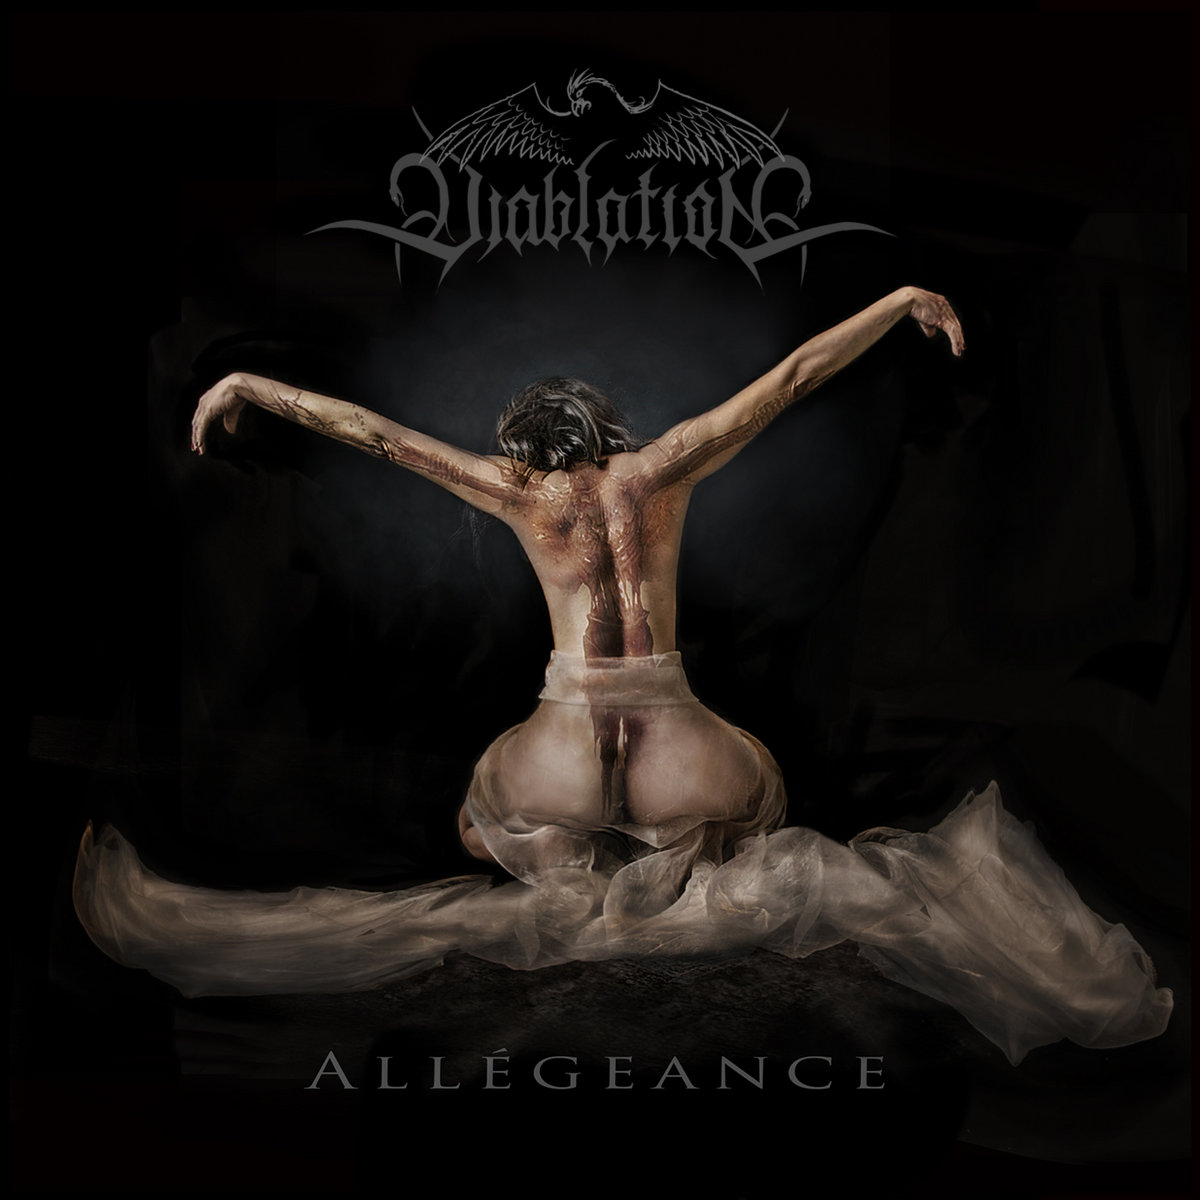 diablation allegeance